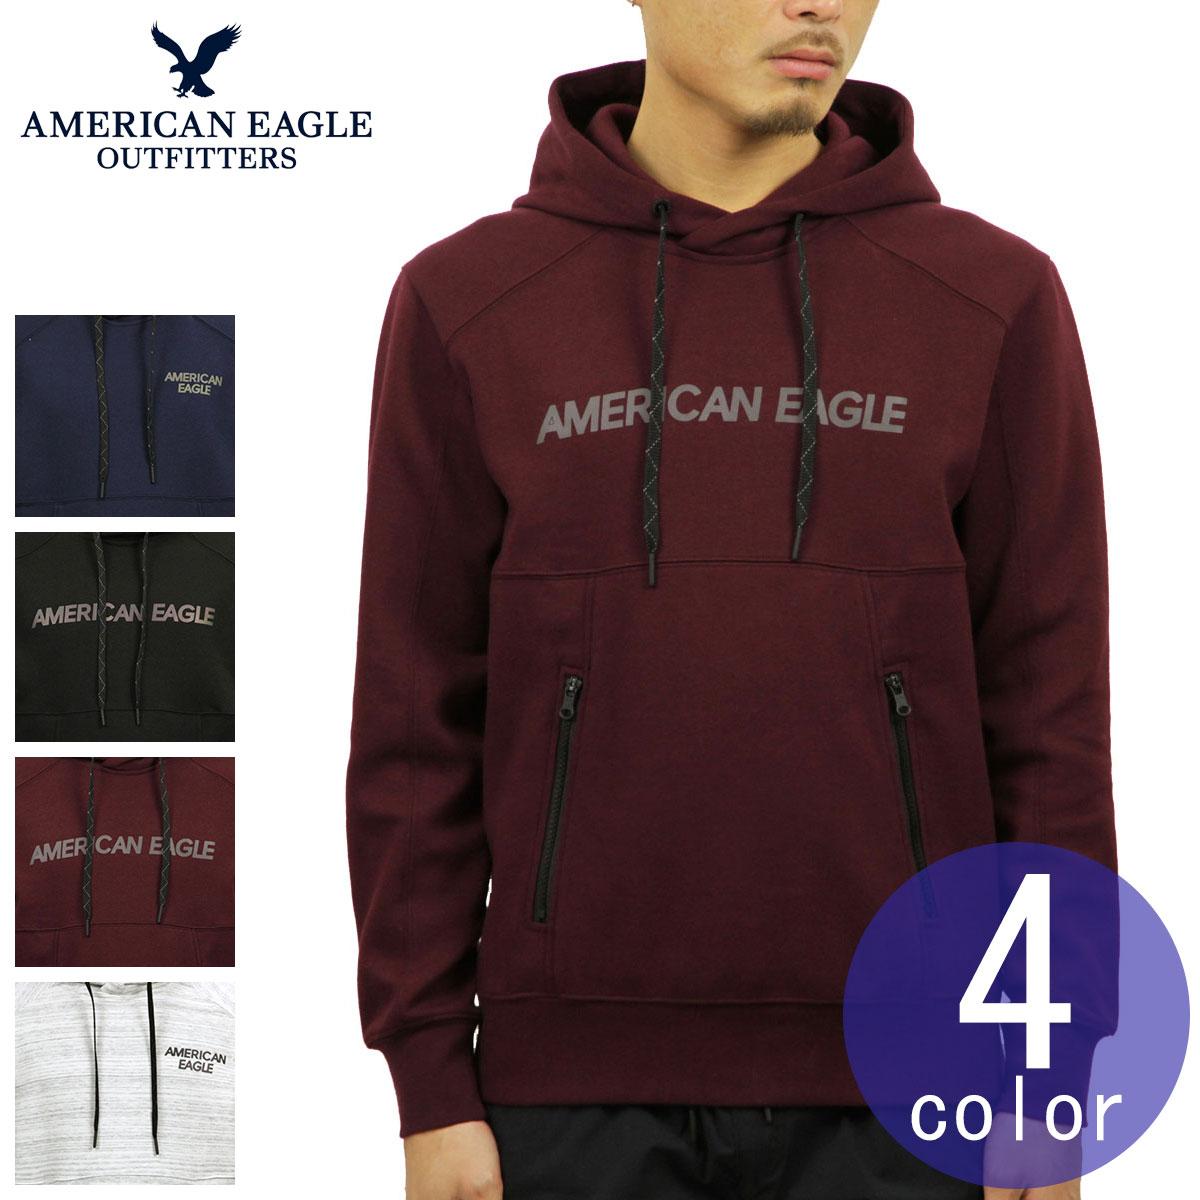 975766b1d American eagle AMERICAN EAGLE regular article men logo graphic pullover  parka AE ACTIVE REFLECTIVE GRAPHIC POPOVER ...